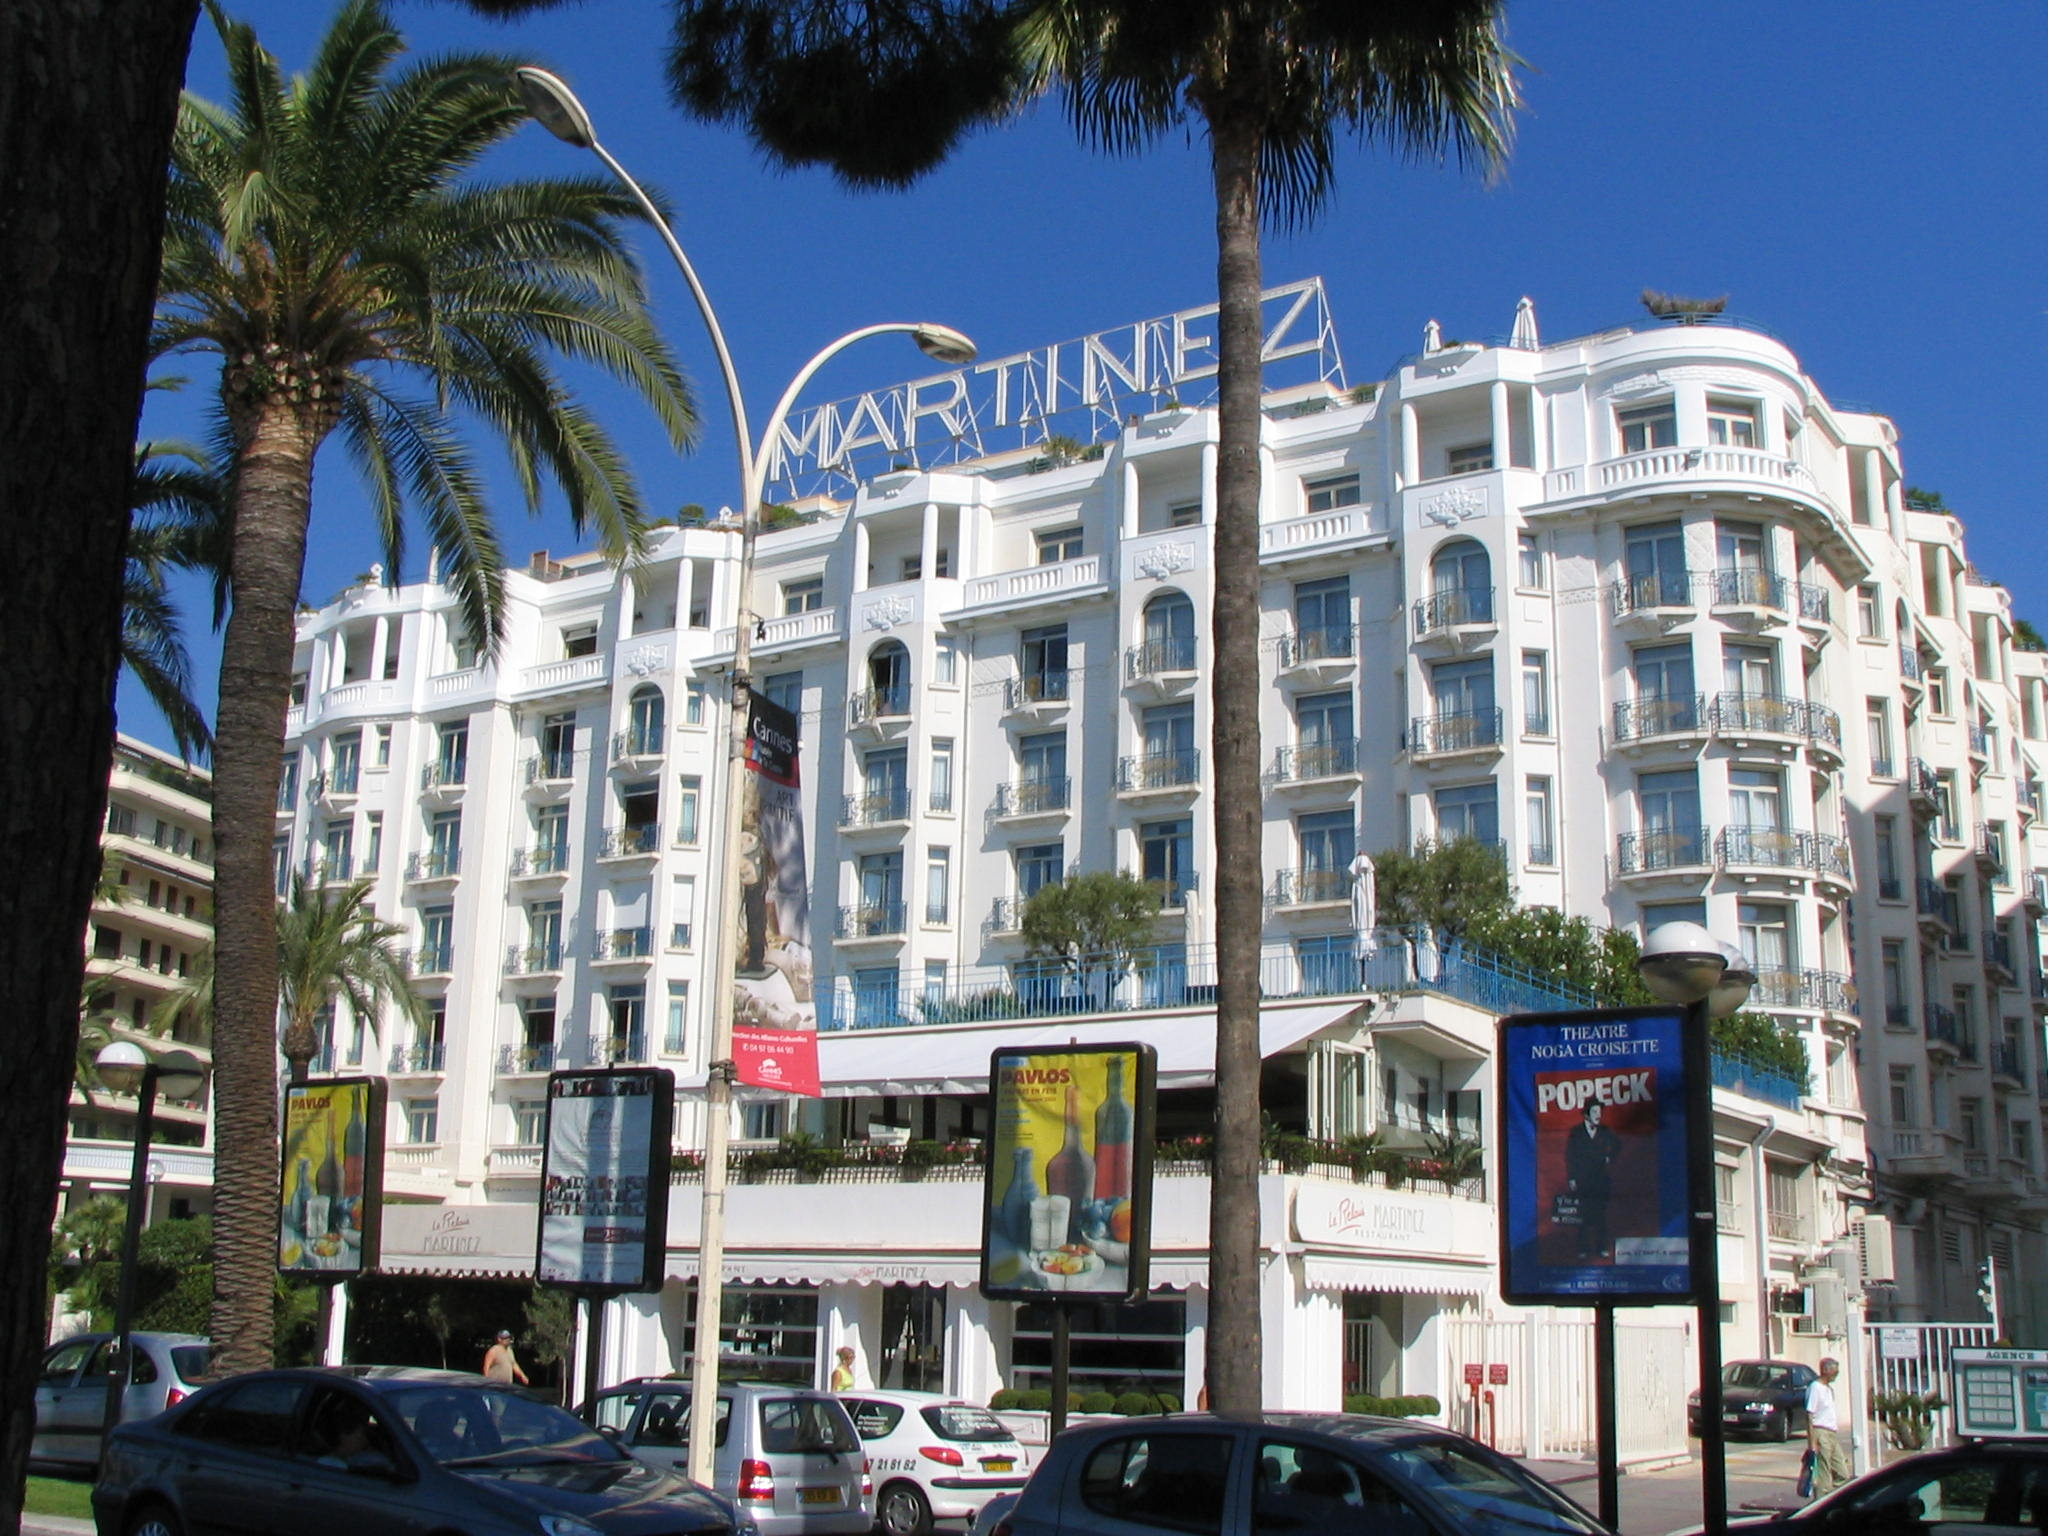 Hotel martinez cannes for Hotel martinez cannes tarifs chambres